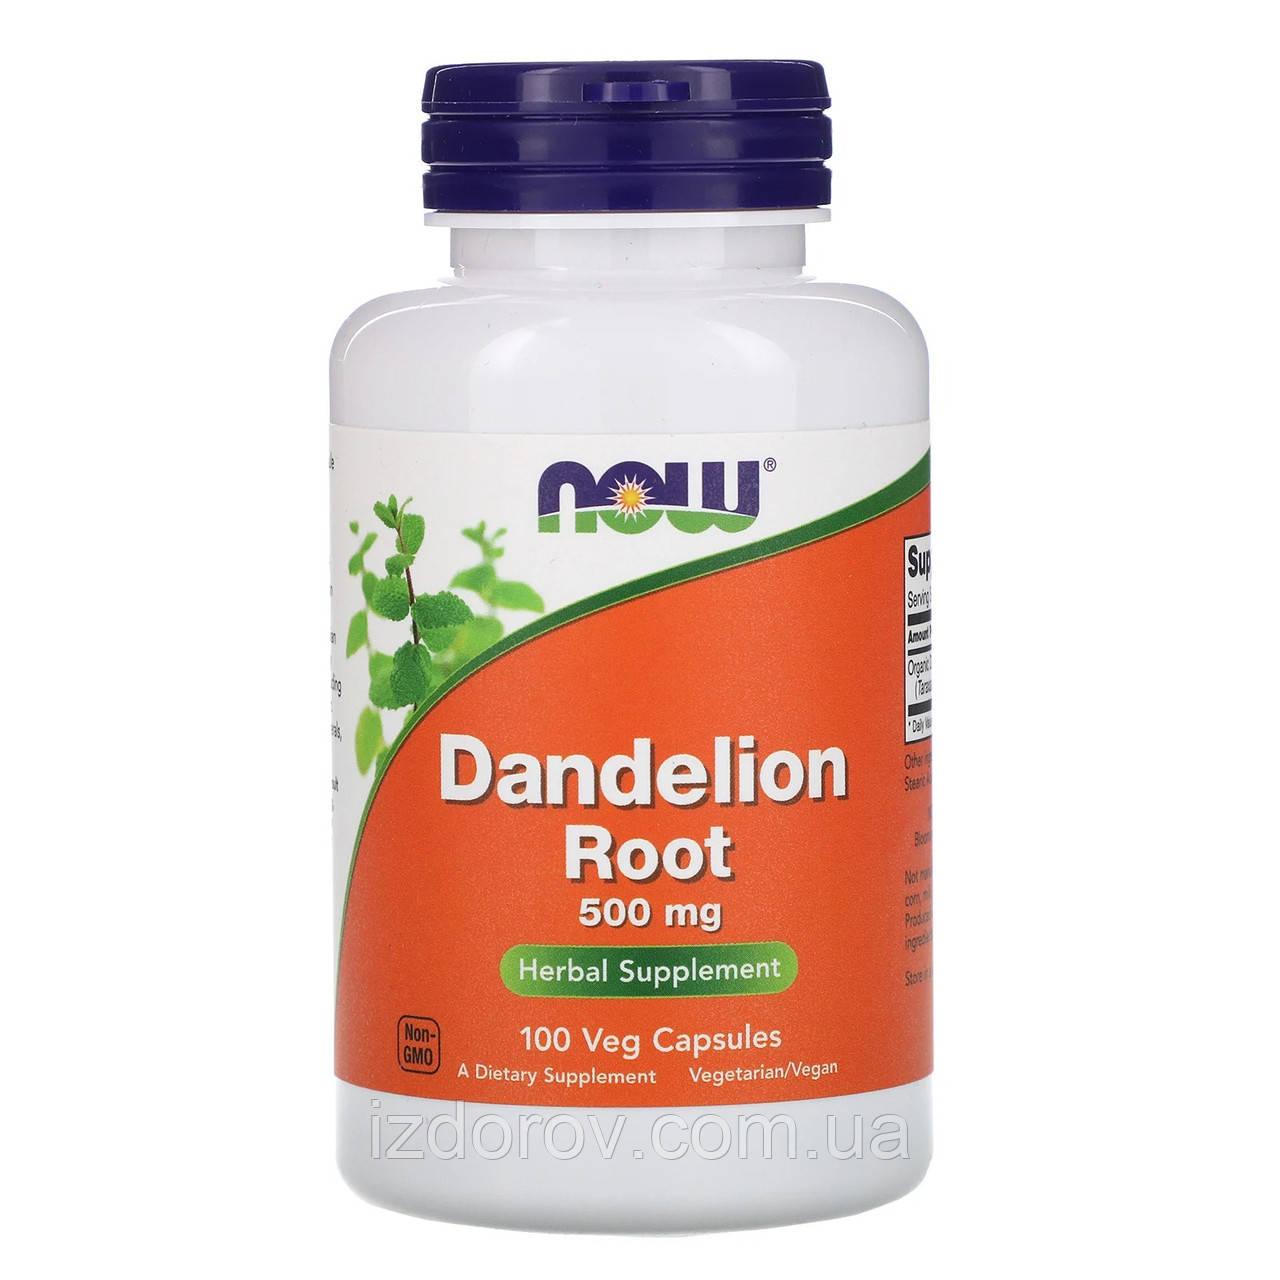 Now Foods, Корень одуванчика, 500 мг, Dandelion Root, 100 вегетарианских капсул